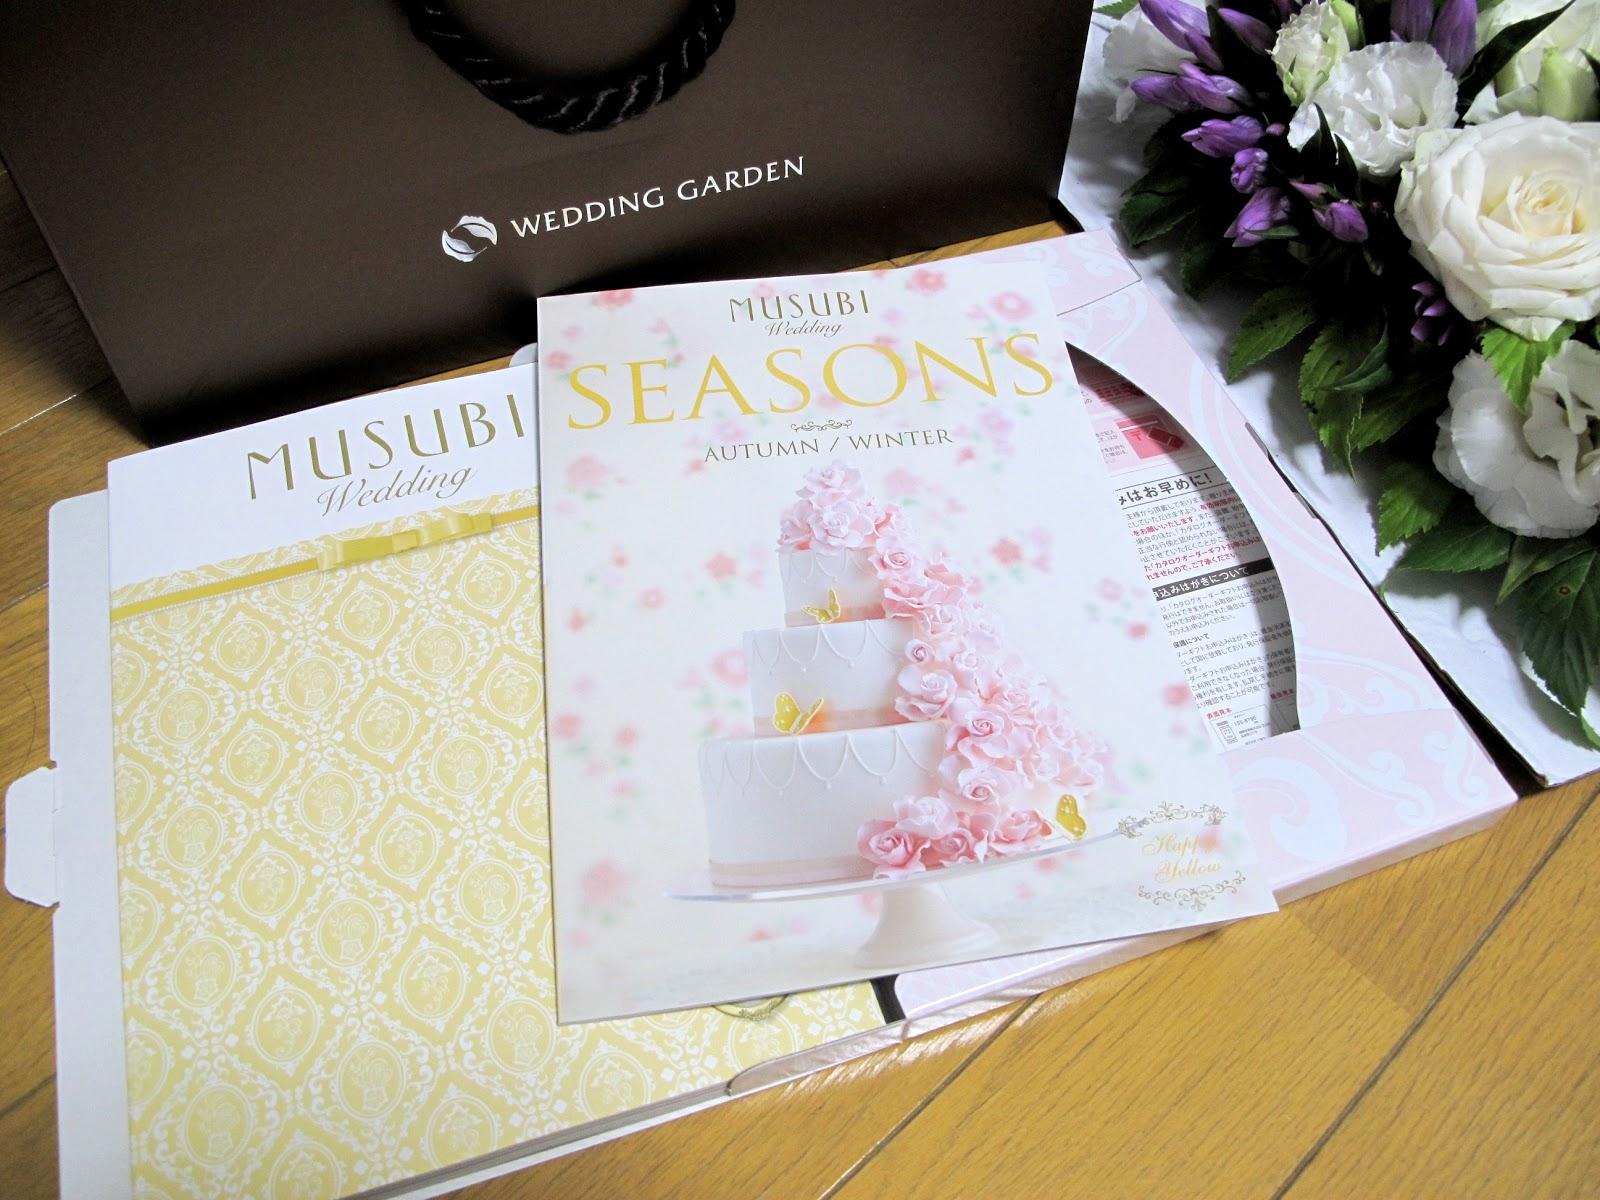 Wedding Ceremony Gifts: EVACOMICS BLOG: Traditional Japanese Wedding Ceremony And